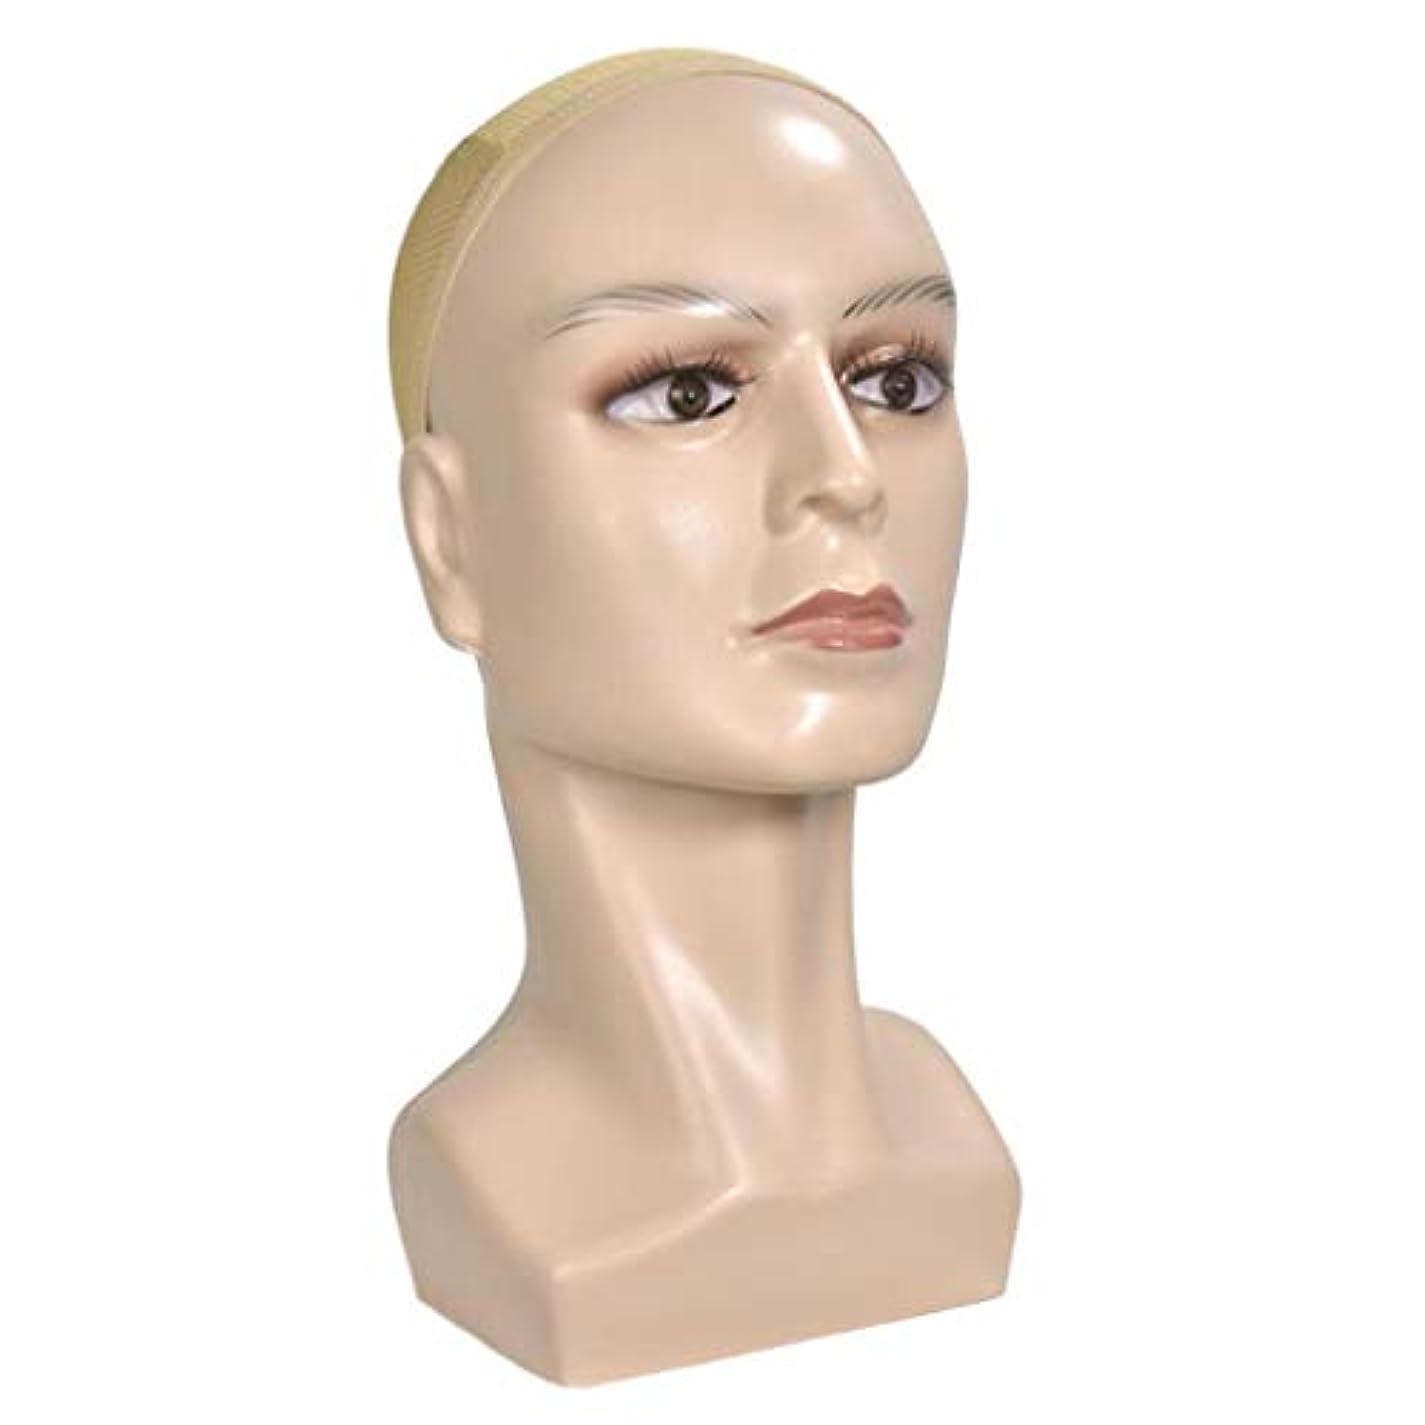 CUTICATE マネキンヘッド ディスプレイ メイクトレーニング 化粧 美容 店舗 自宅 サロン 全2色 - 肌の色